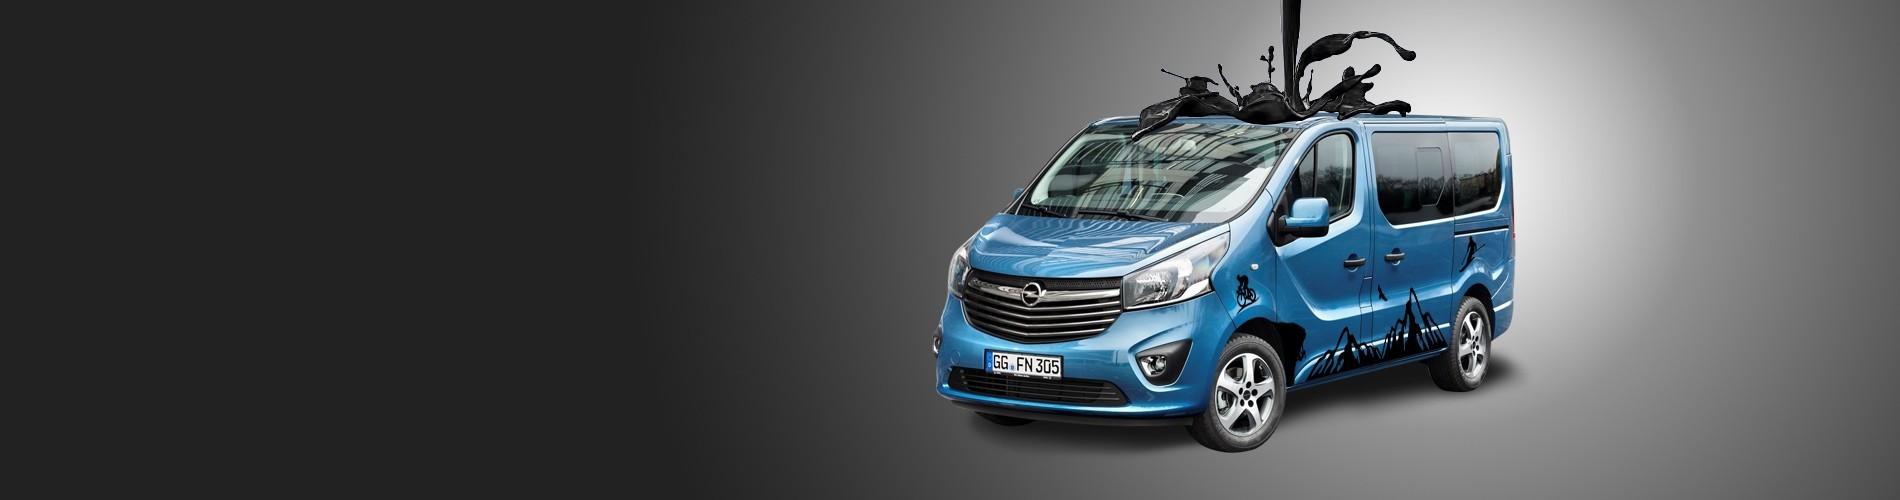 My Beautiful Car - Opel Vivaro Decals